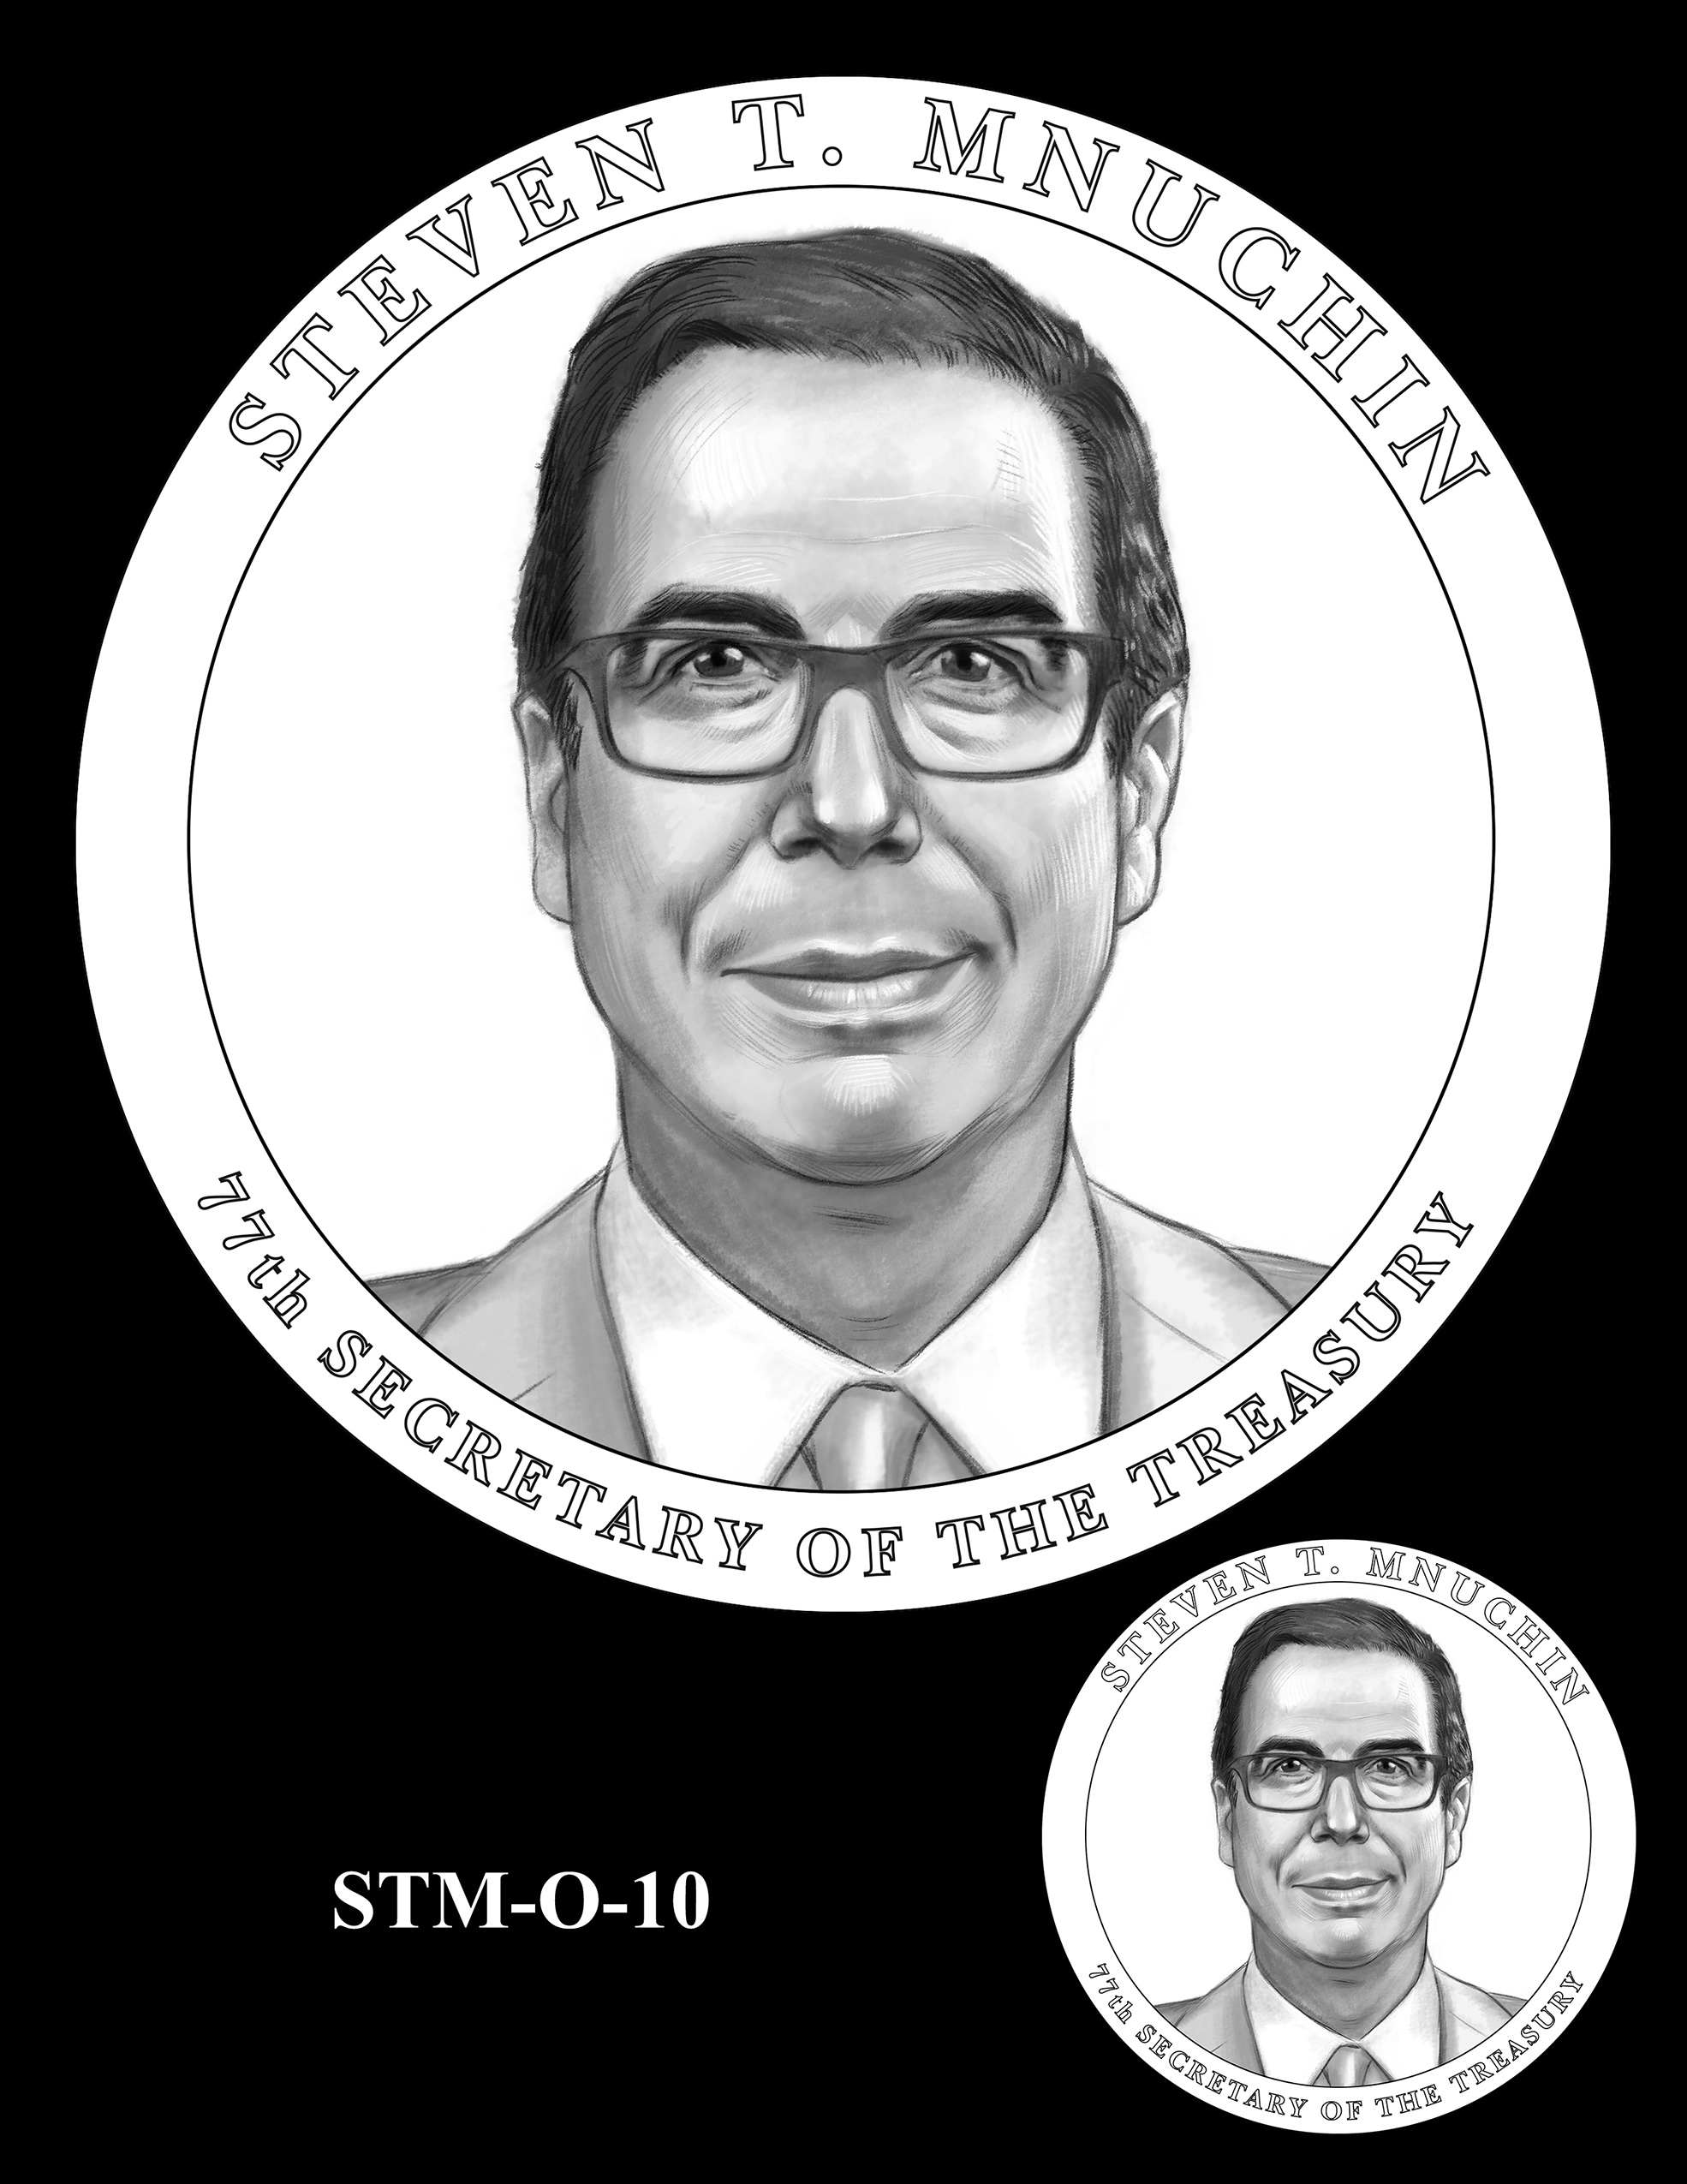 STM-O-10 -- Steven T. Mnuchin Secretary of the Treasury Medal